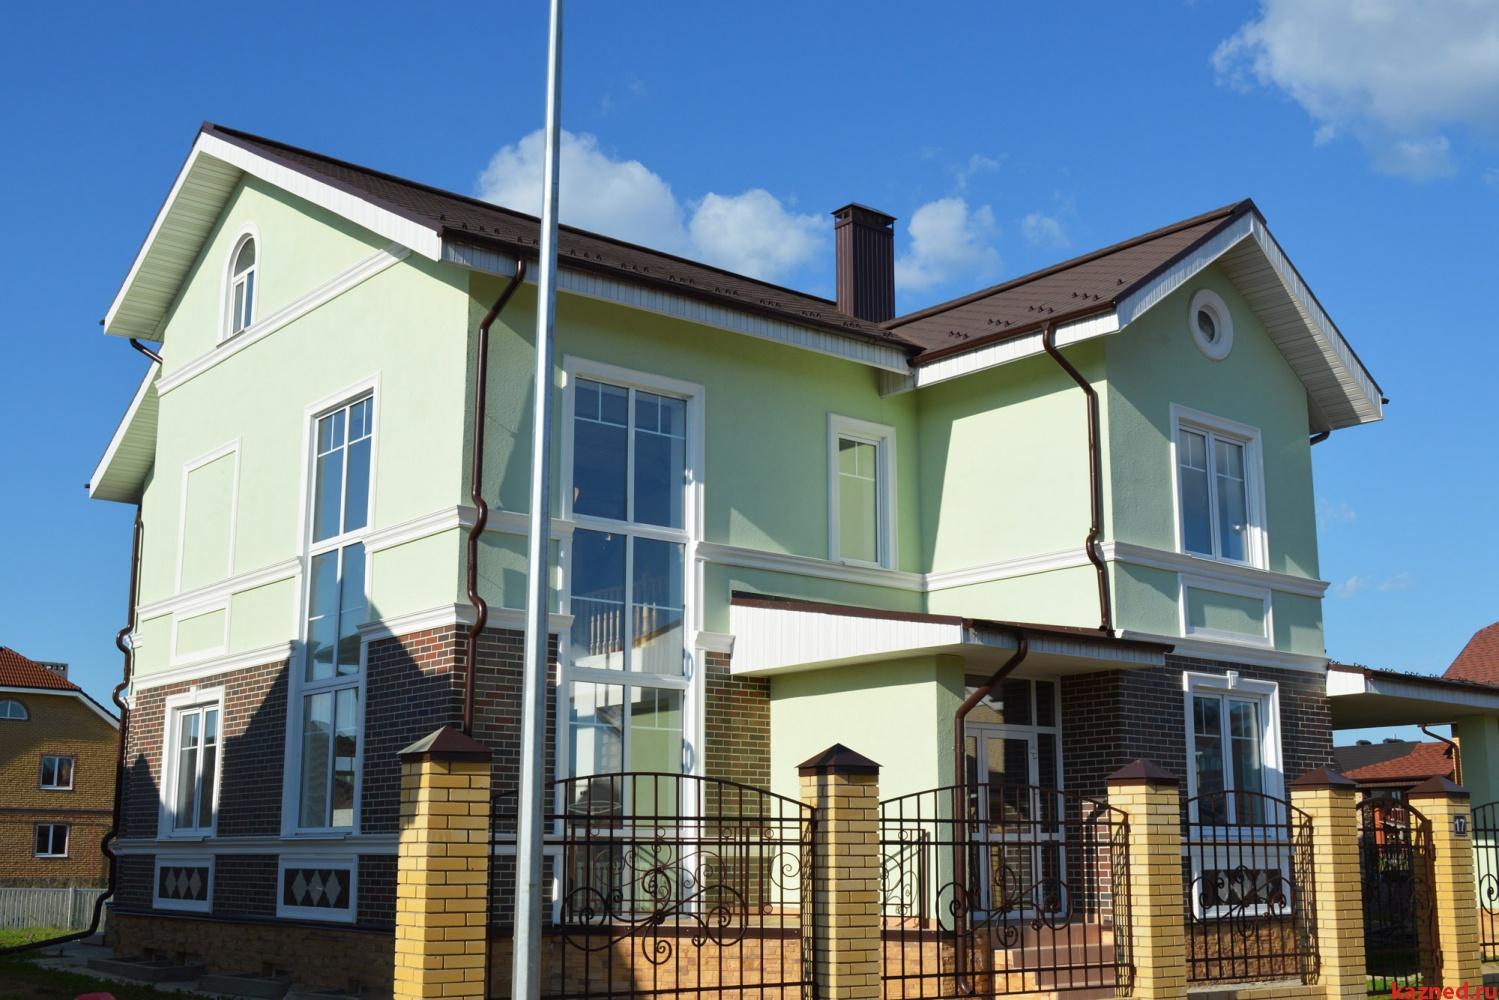 Продажа  Дома п.Дубровка, п.Ореховка, 306 м2  (миниатюра №1)